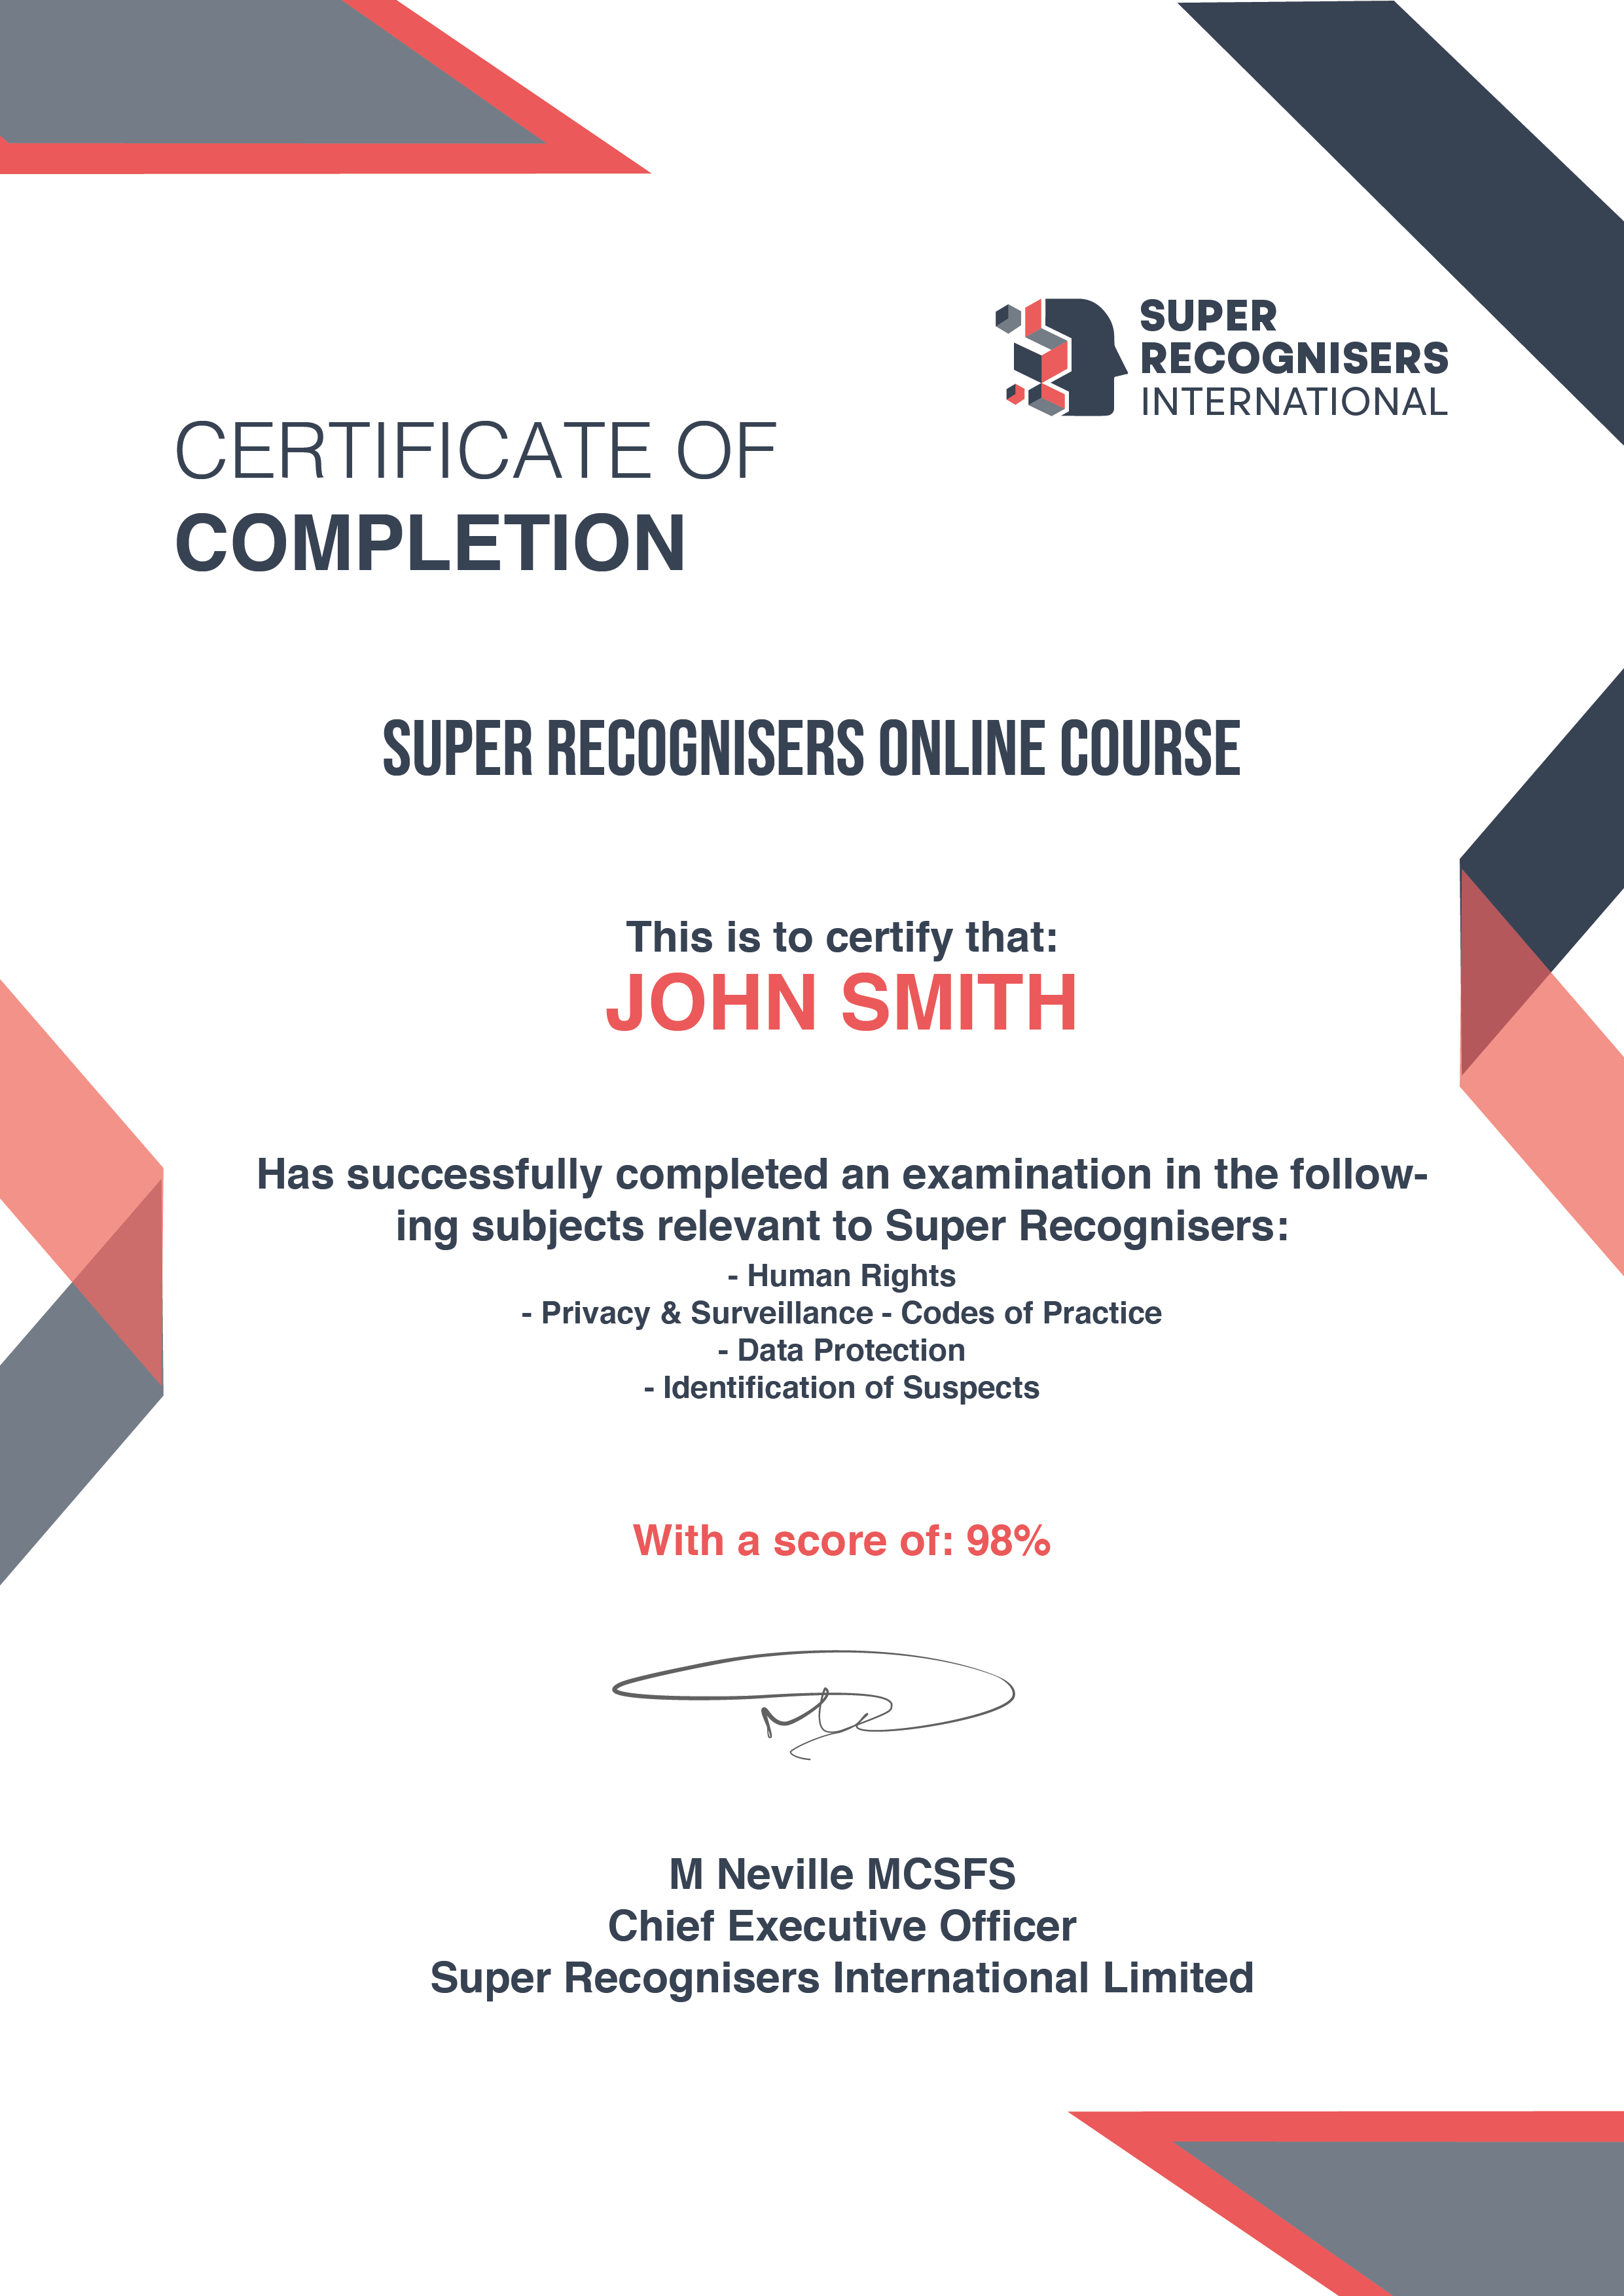 Online Course Certificate Super Recognisers International - Kent, England - Main background